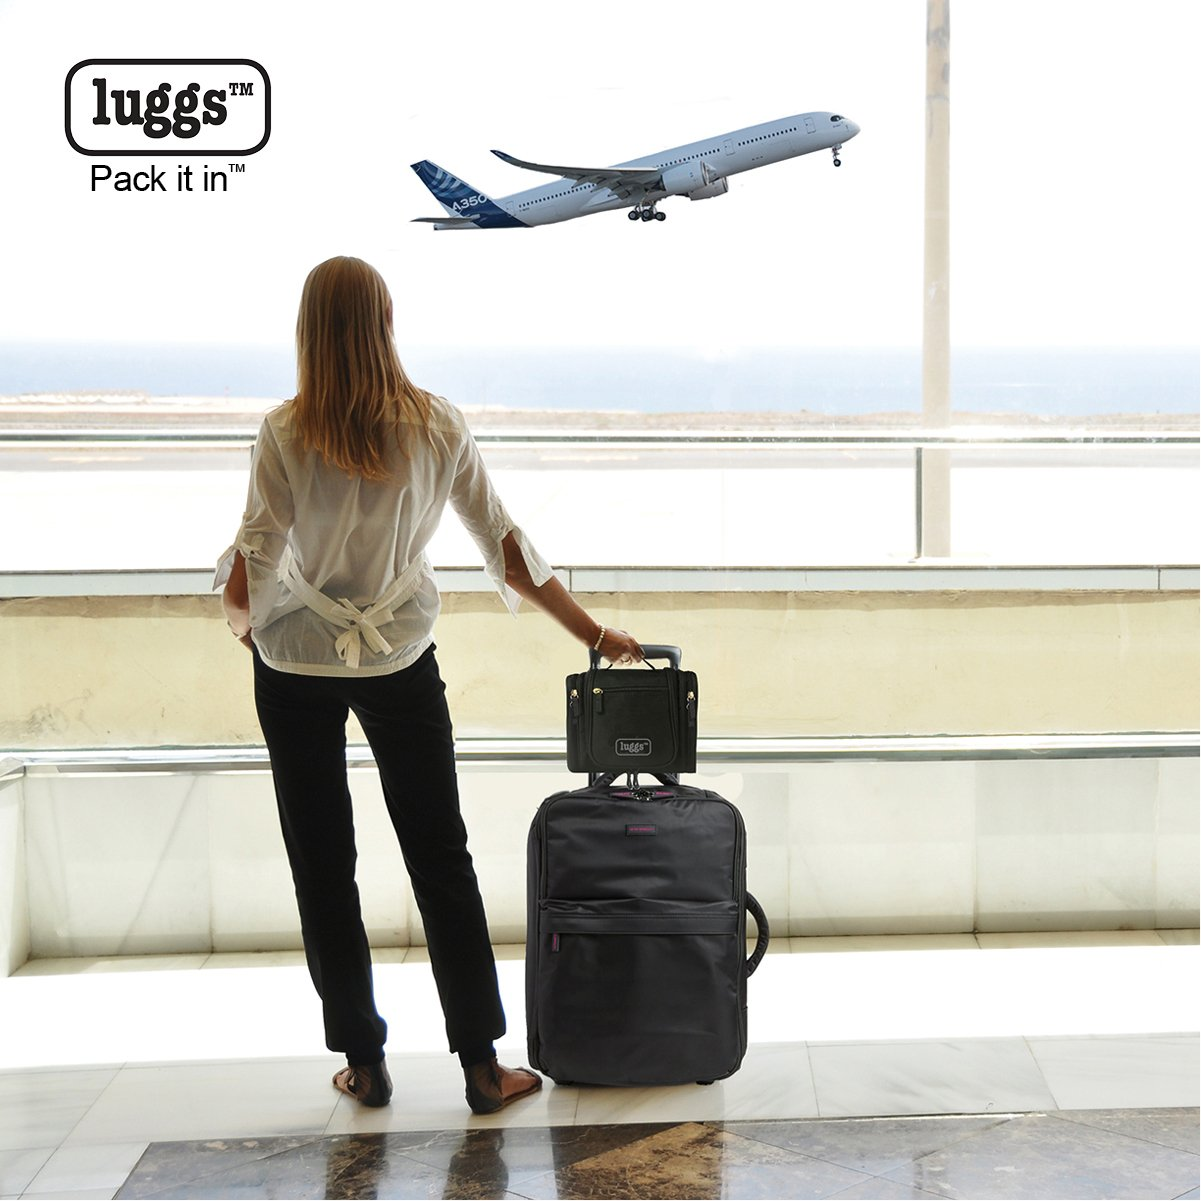 Travel Toiletry Bags Travel Bottle Set For Shower Cosmetics - Travel bag for bathroom items for bathroom decor ideas